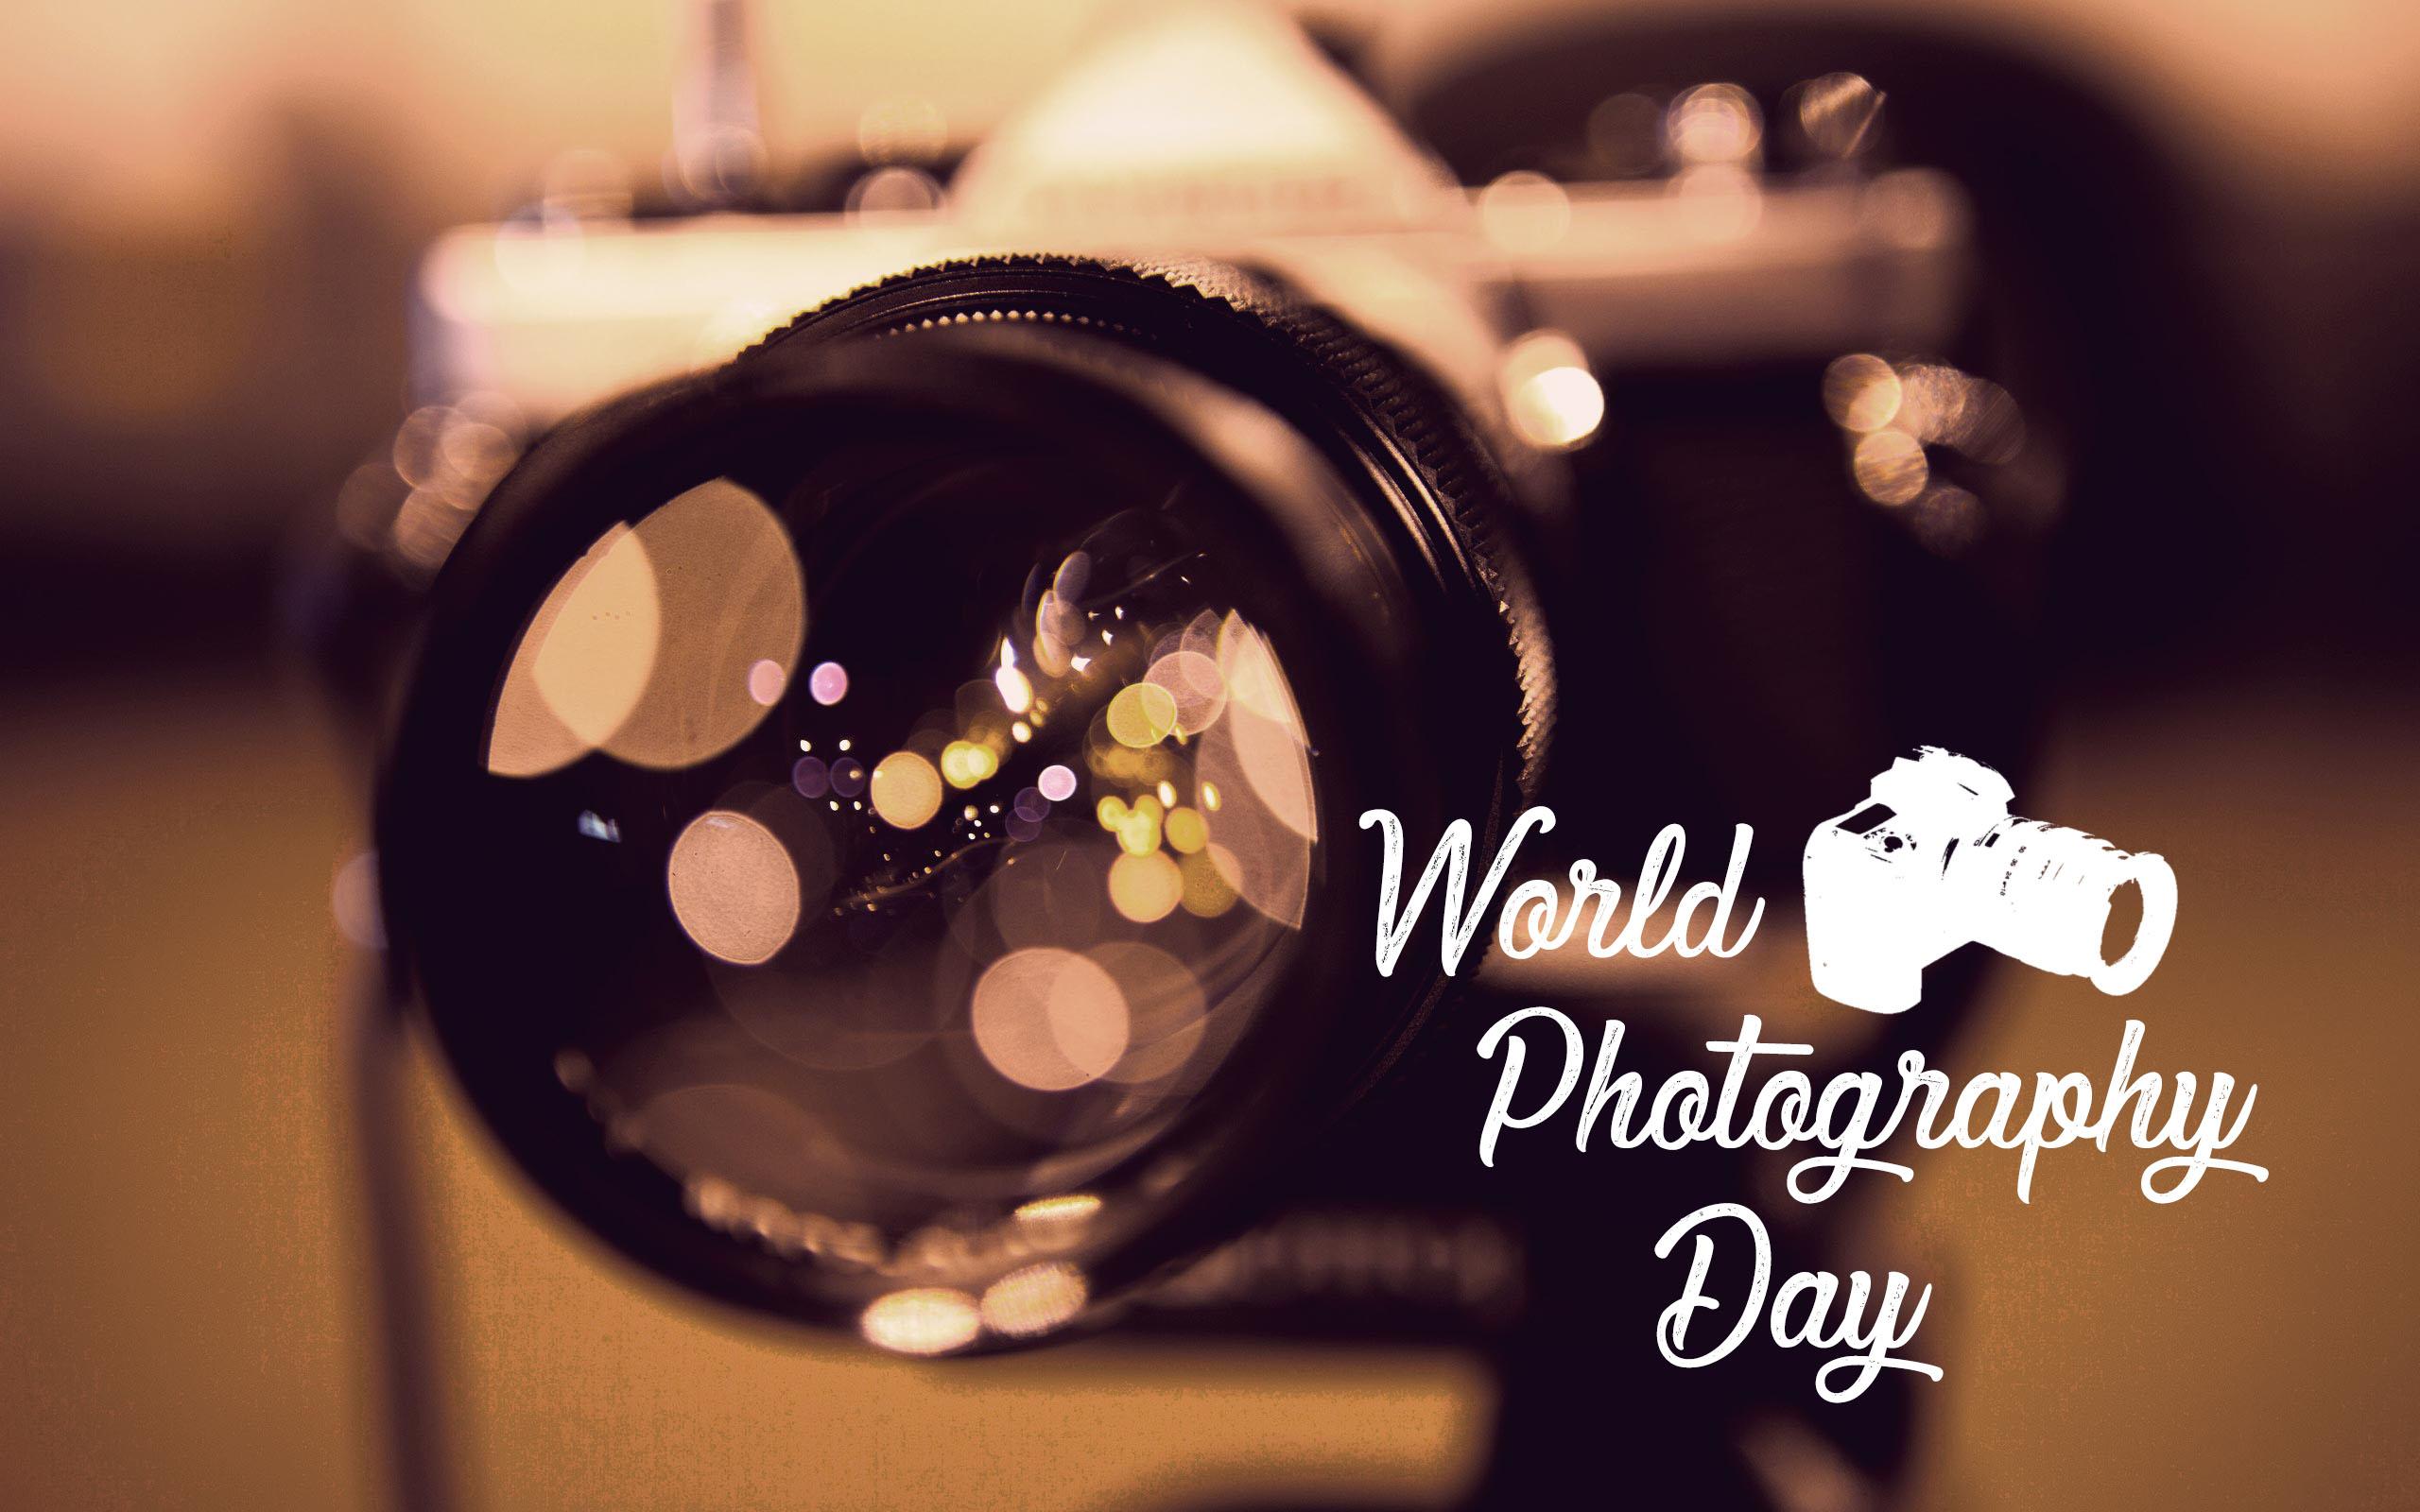 World Photography Day Wishes 2560x1600 Wallpaper Teahub Io